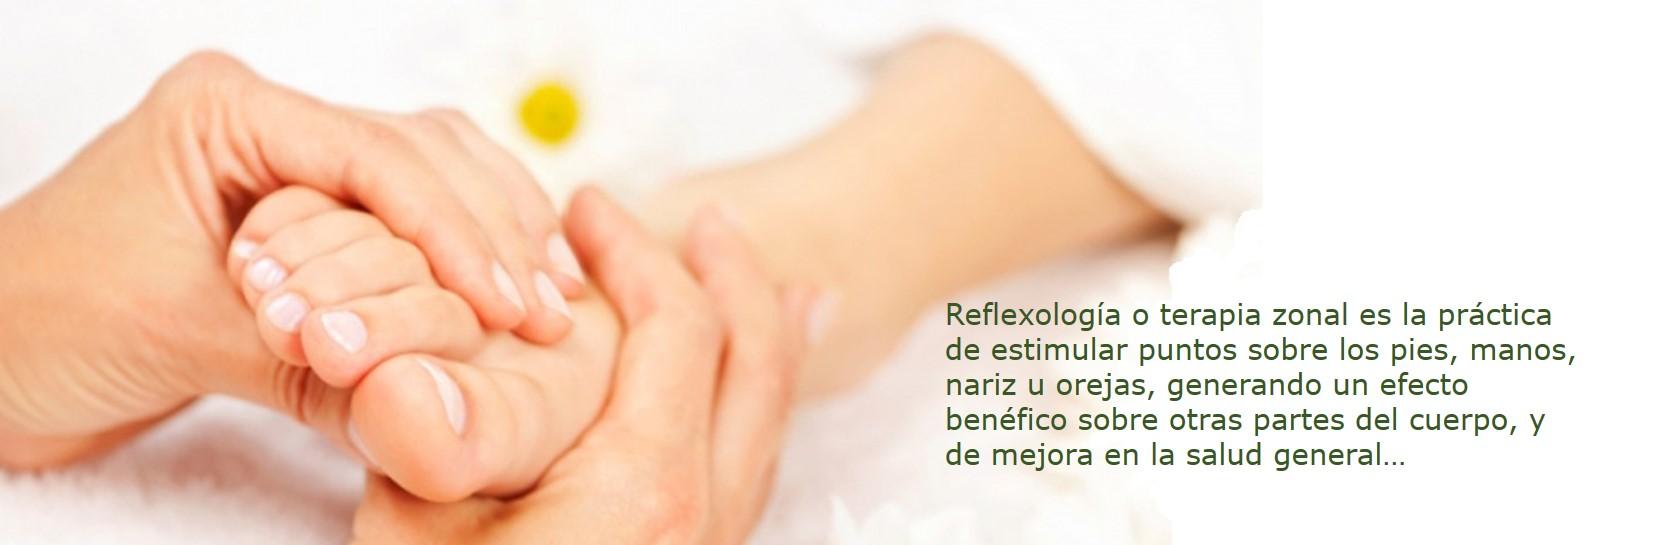 terapia de reflexologia